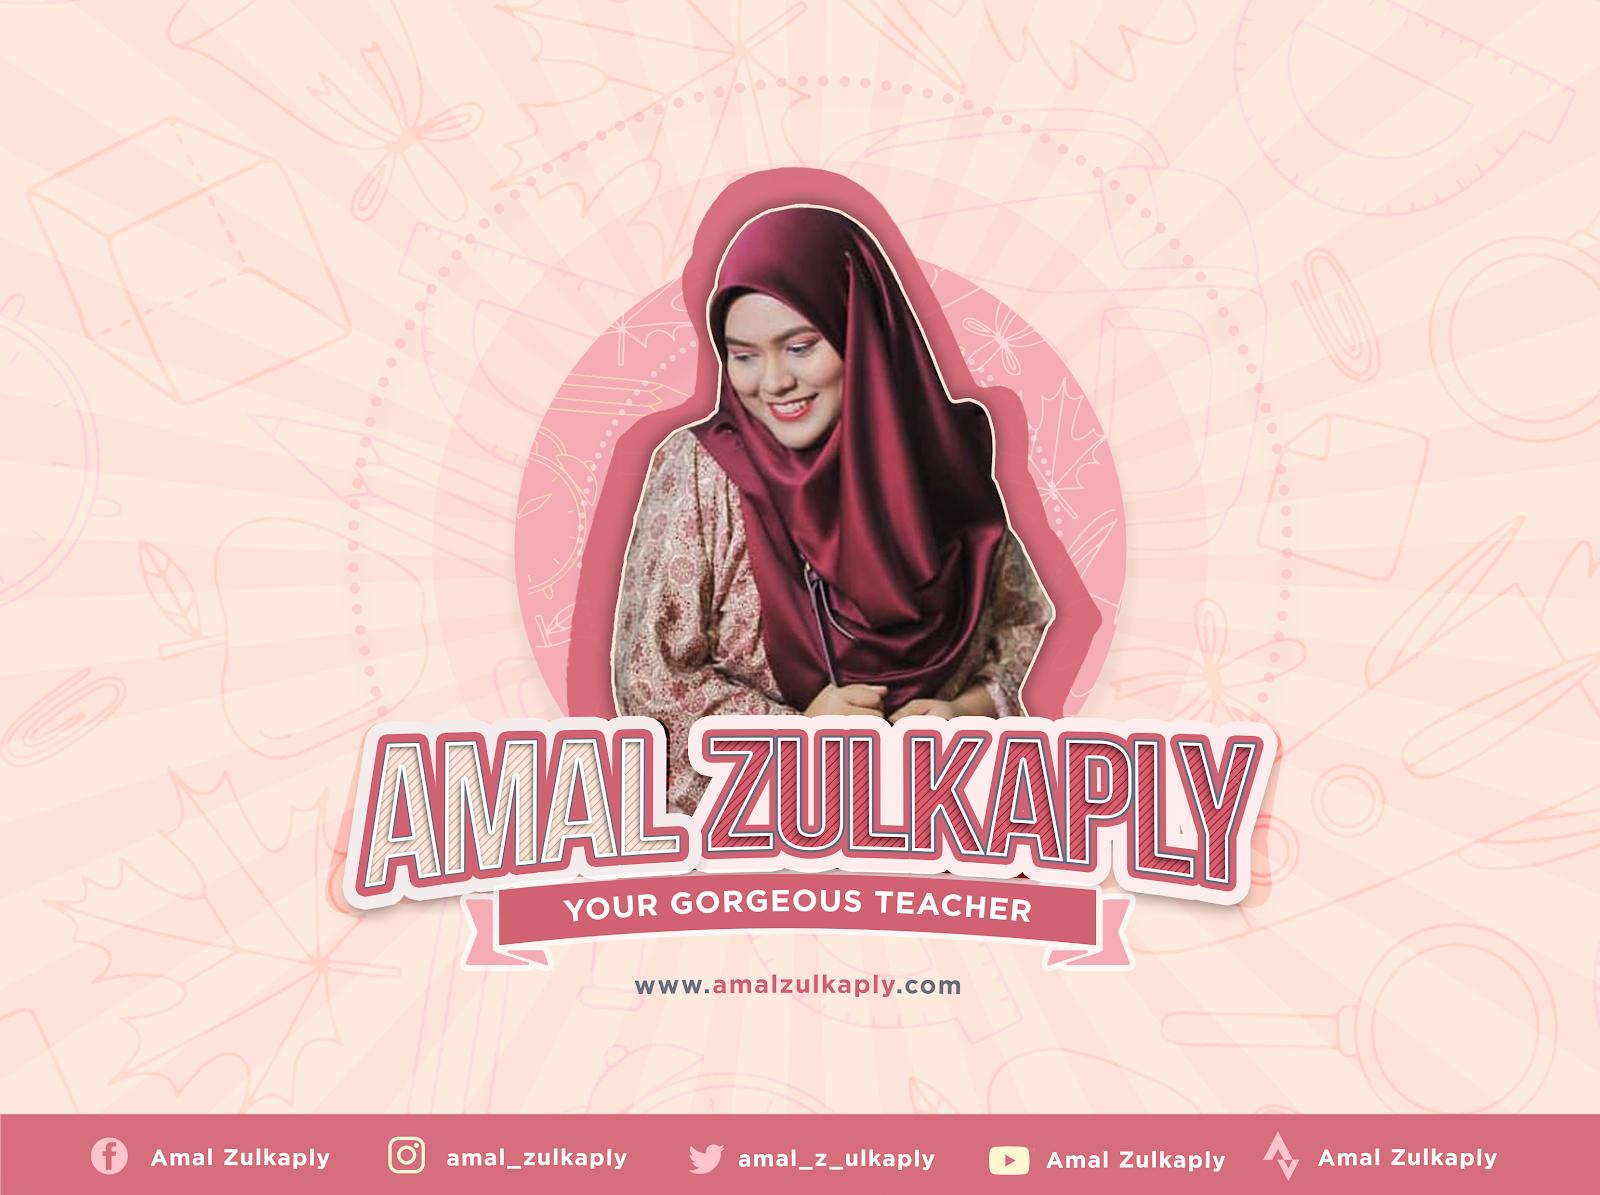 Amal Zulkaply